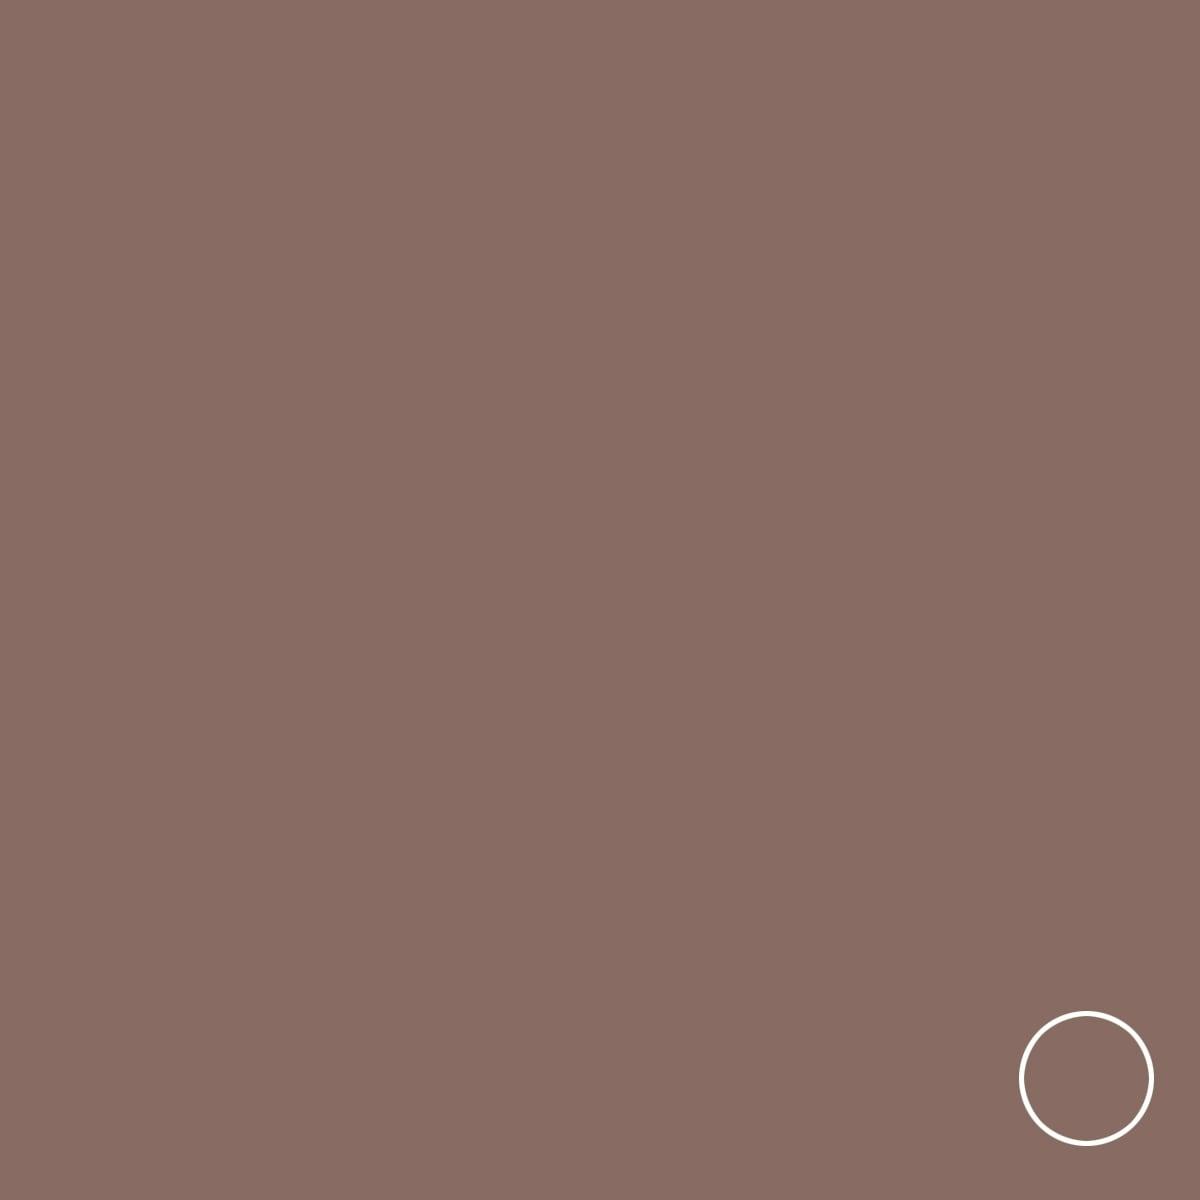 ORGANIC LINE (5ml)  - PIGMENT AREOLES 30 ORGANICLINE AMIEA (5 ml)